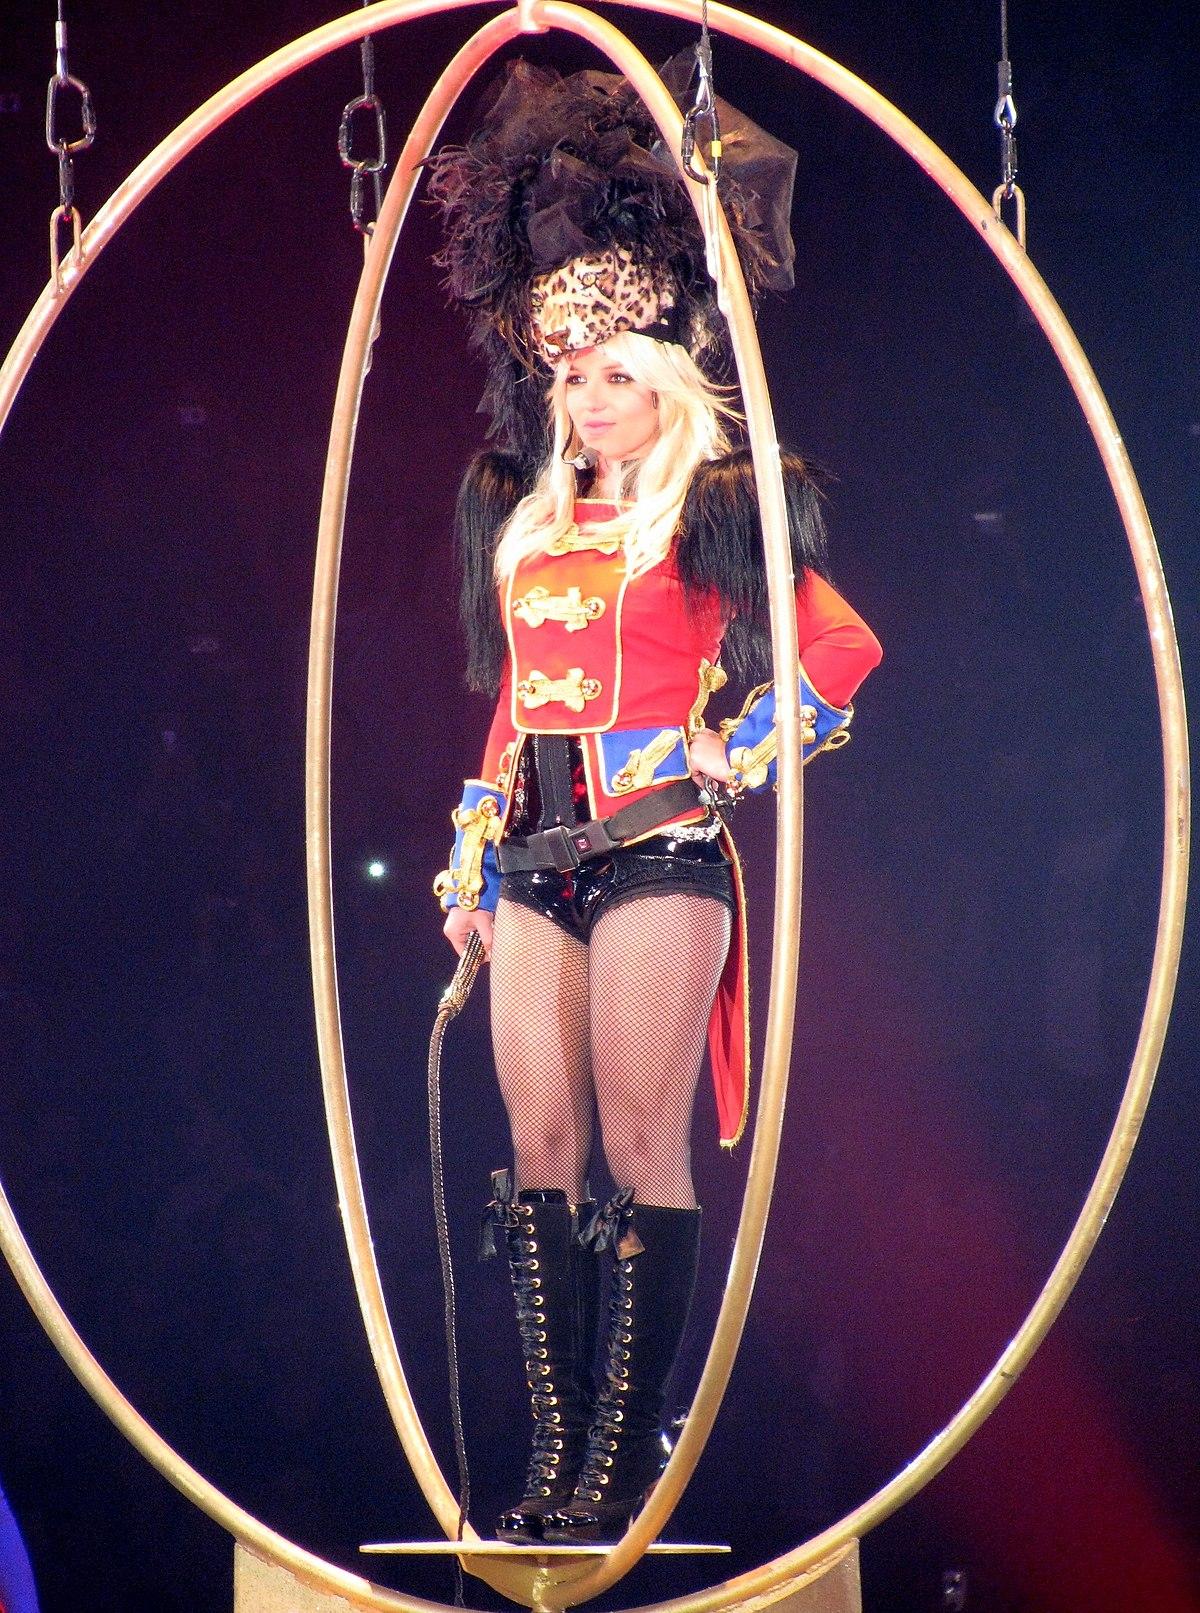 1200px-Circus-Tour.jpg